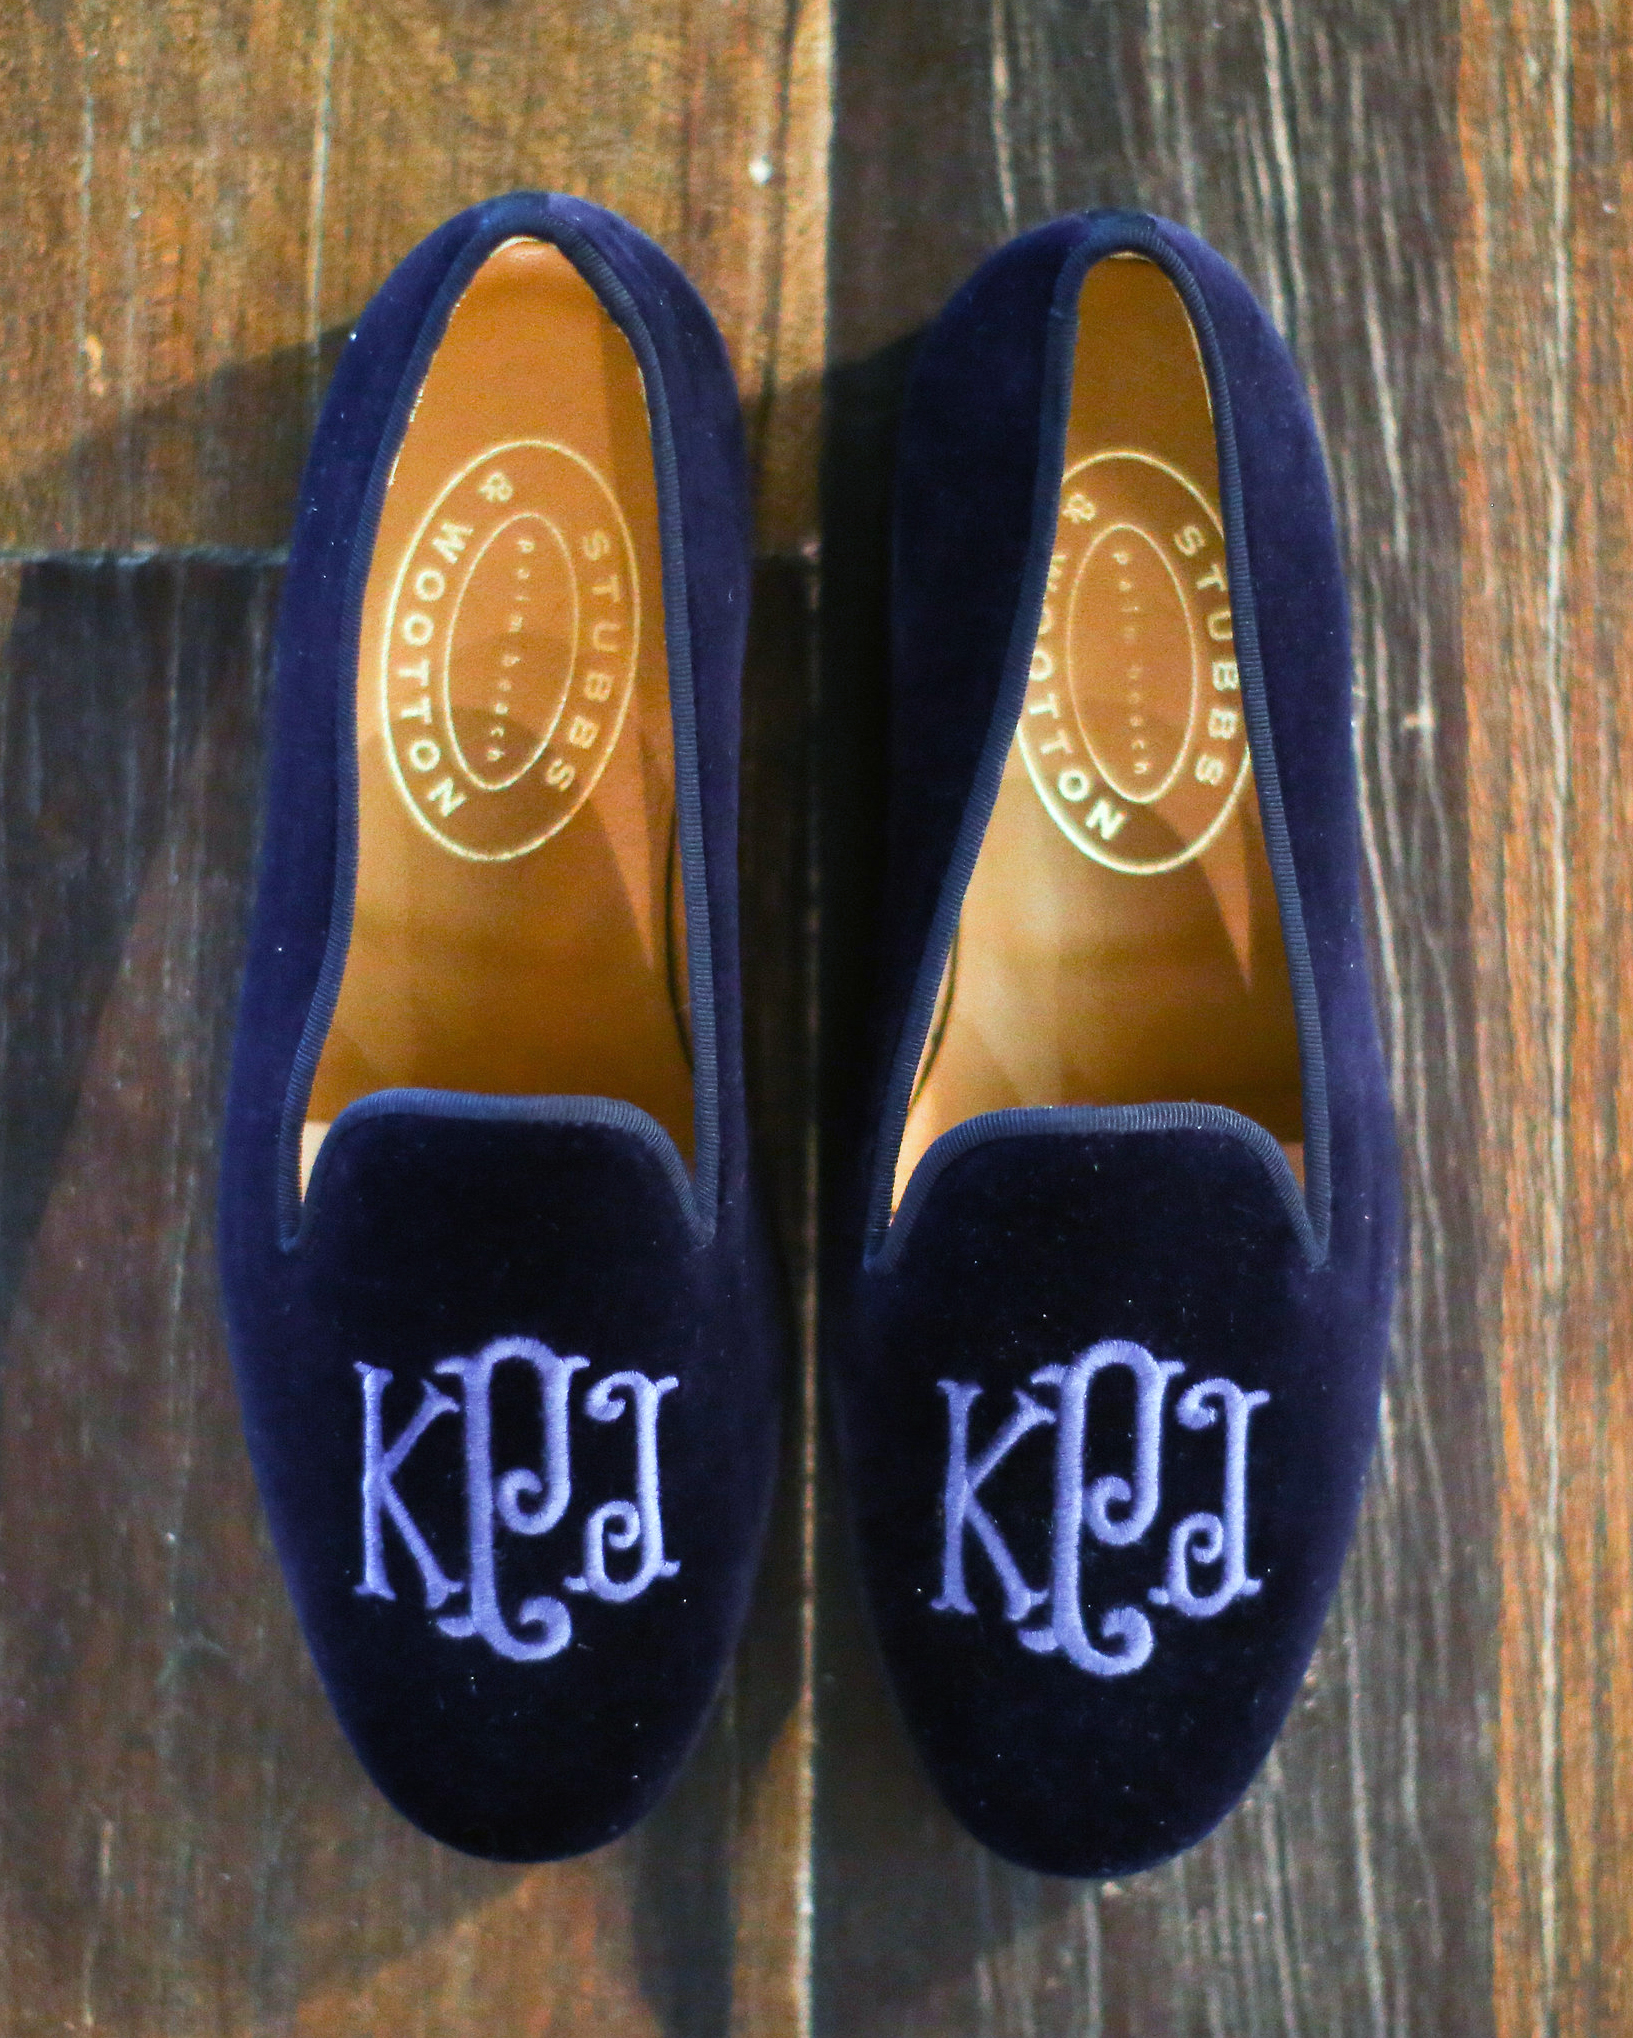 olivia-keith-wedding-shoes-32-s112304-0815.jpg